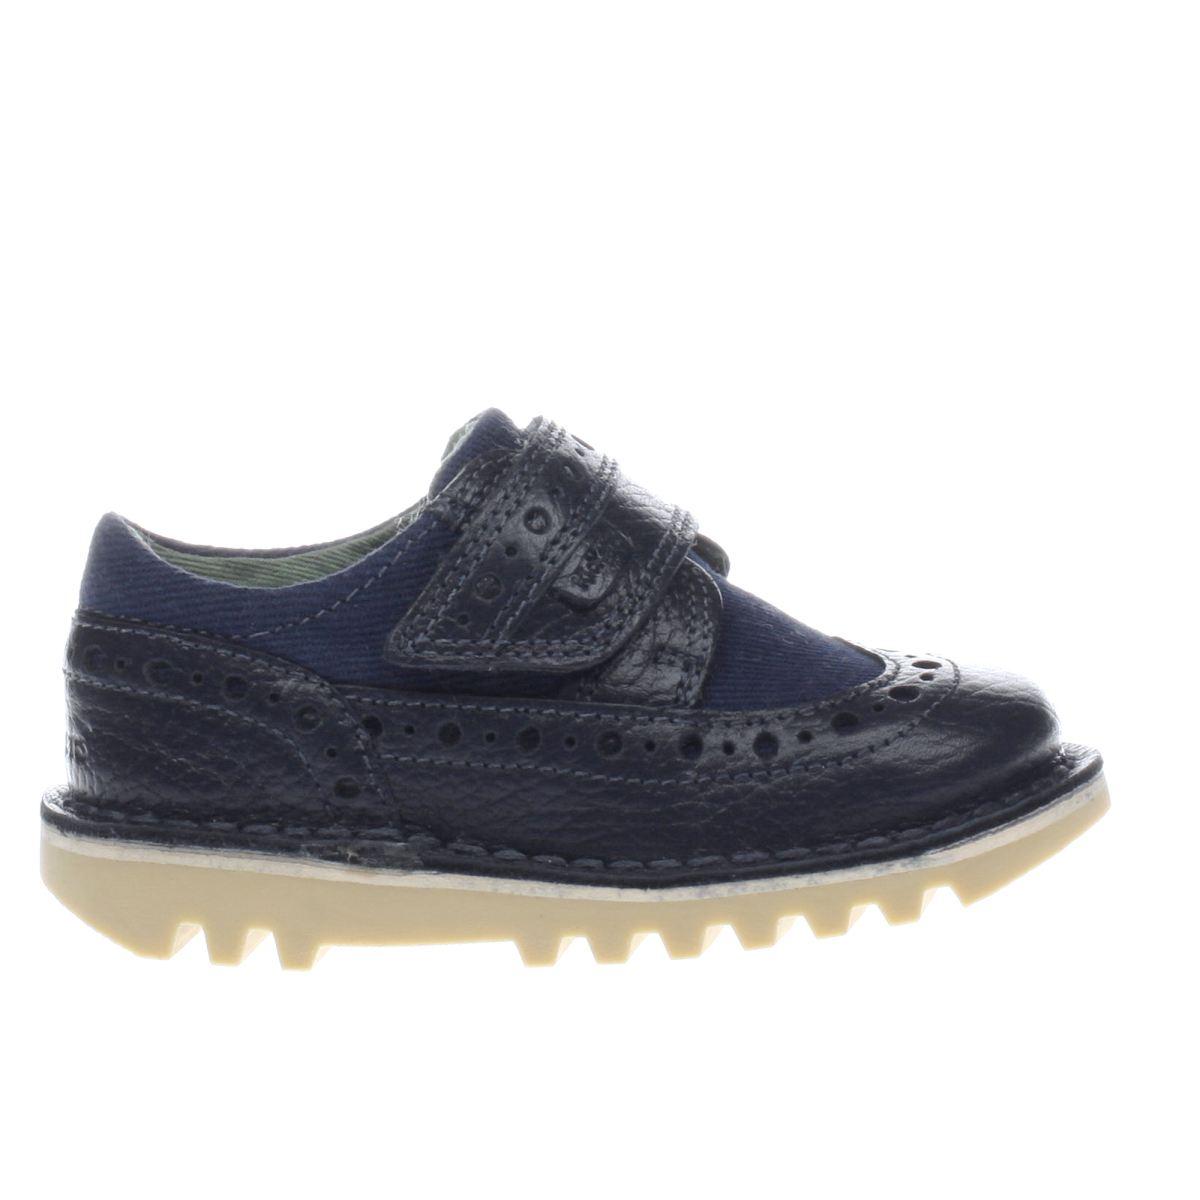 Black kicker sandals - Kickers Navy Longwing Unisex Toddler